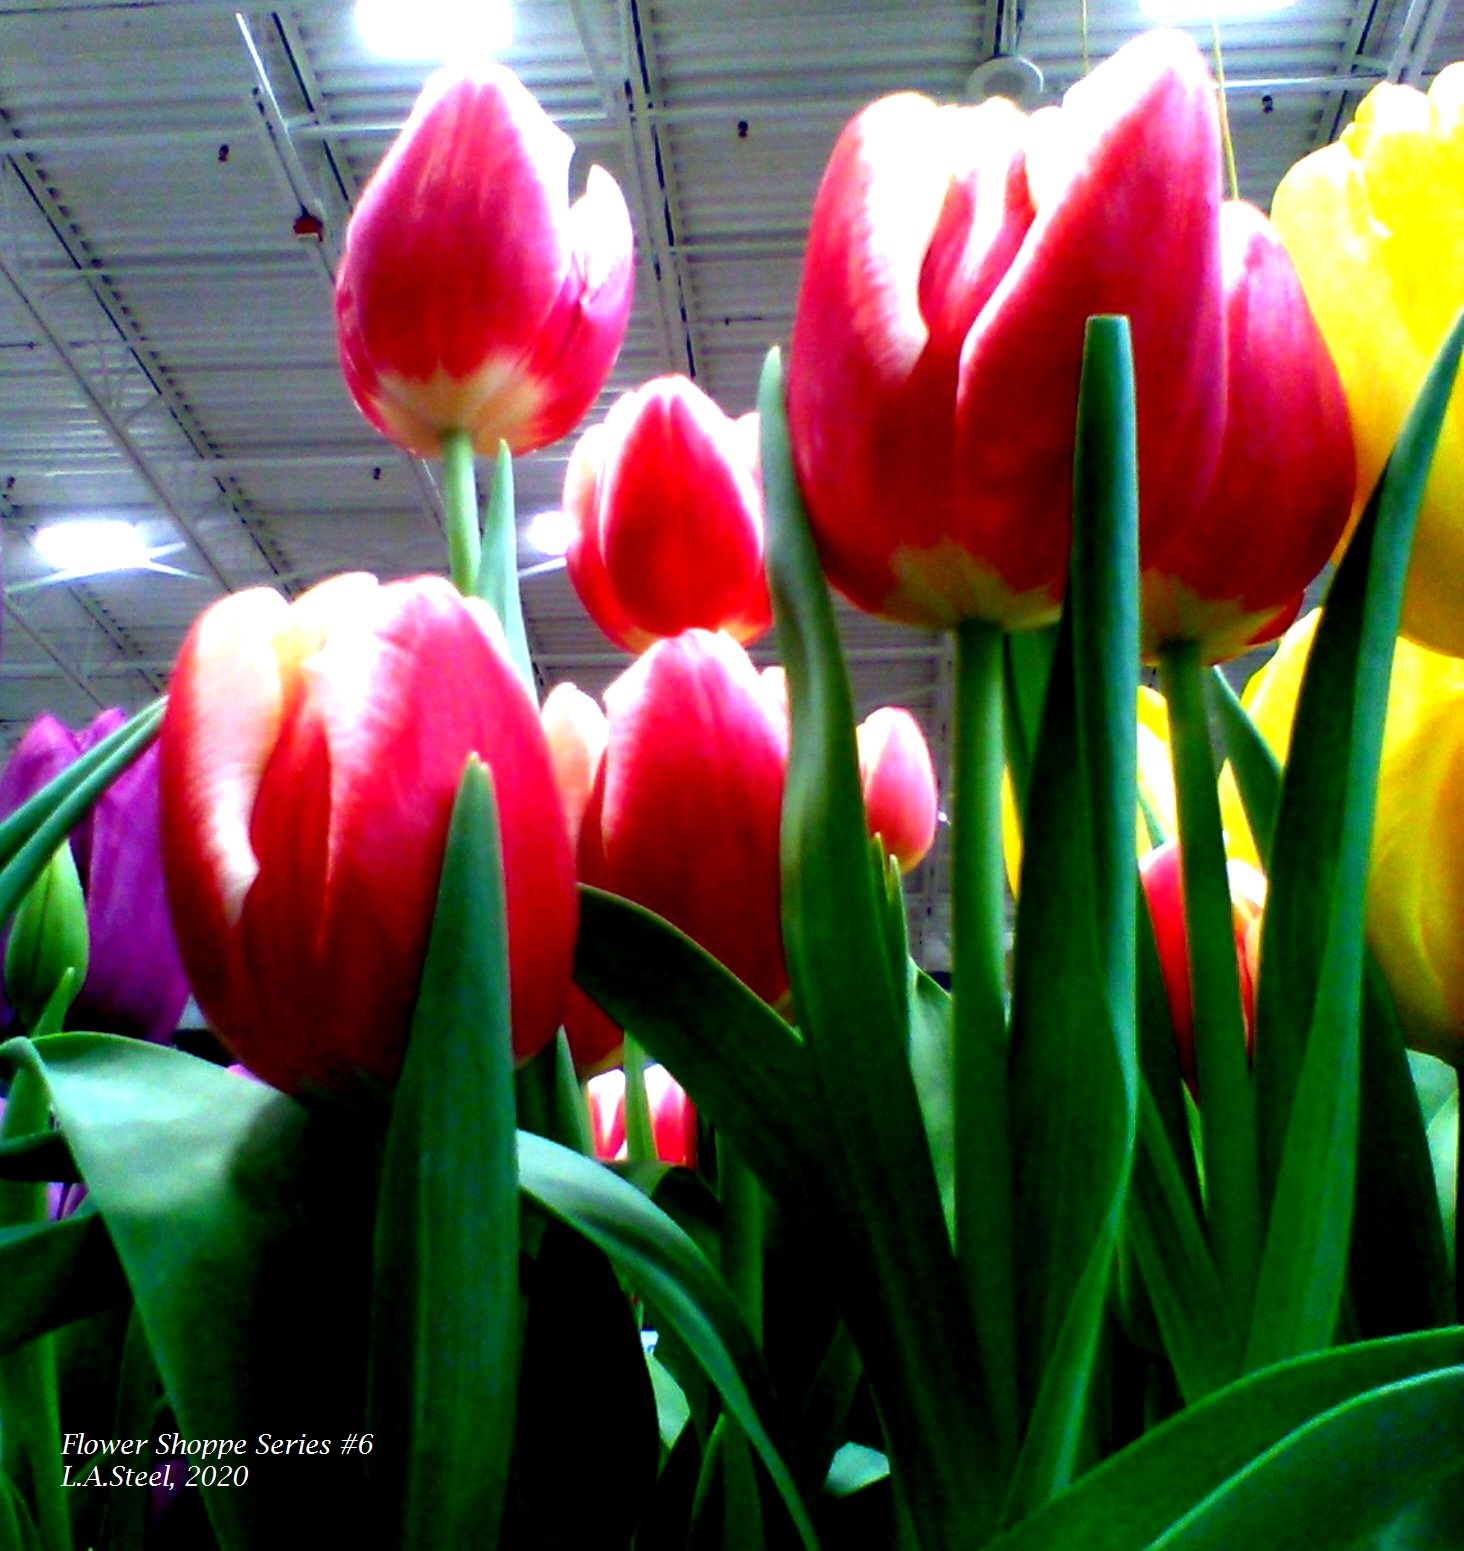 flower shoppe series #6 6 2020